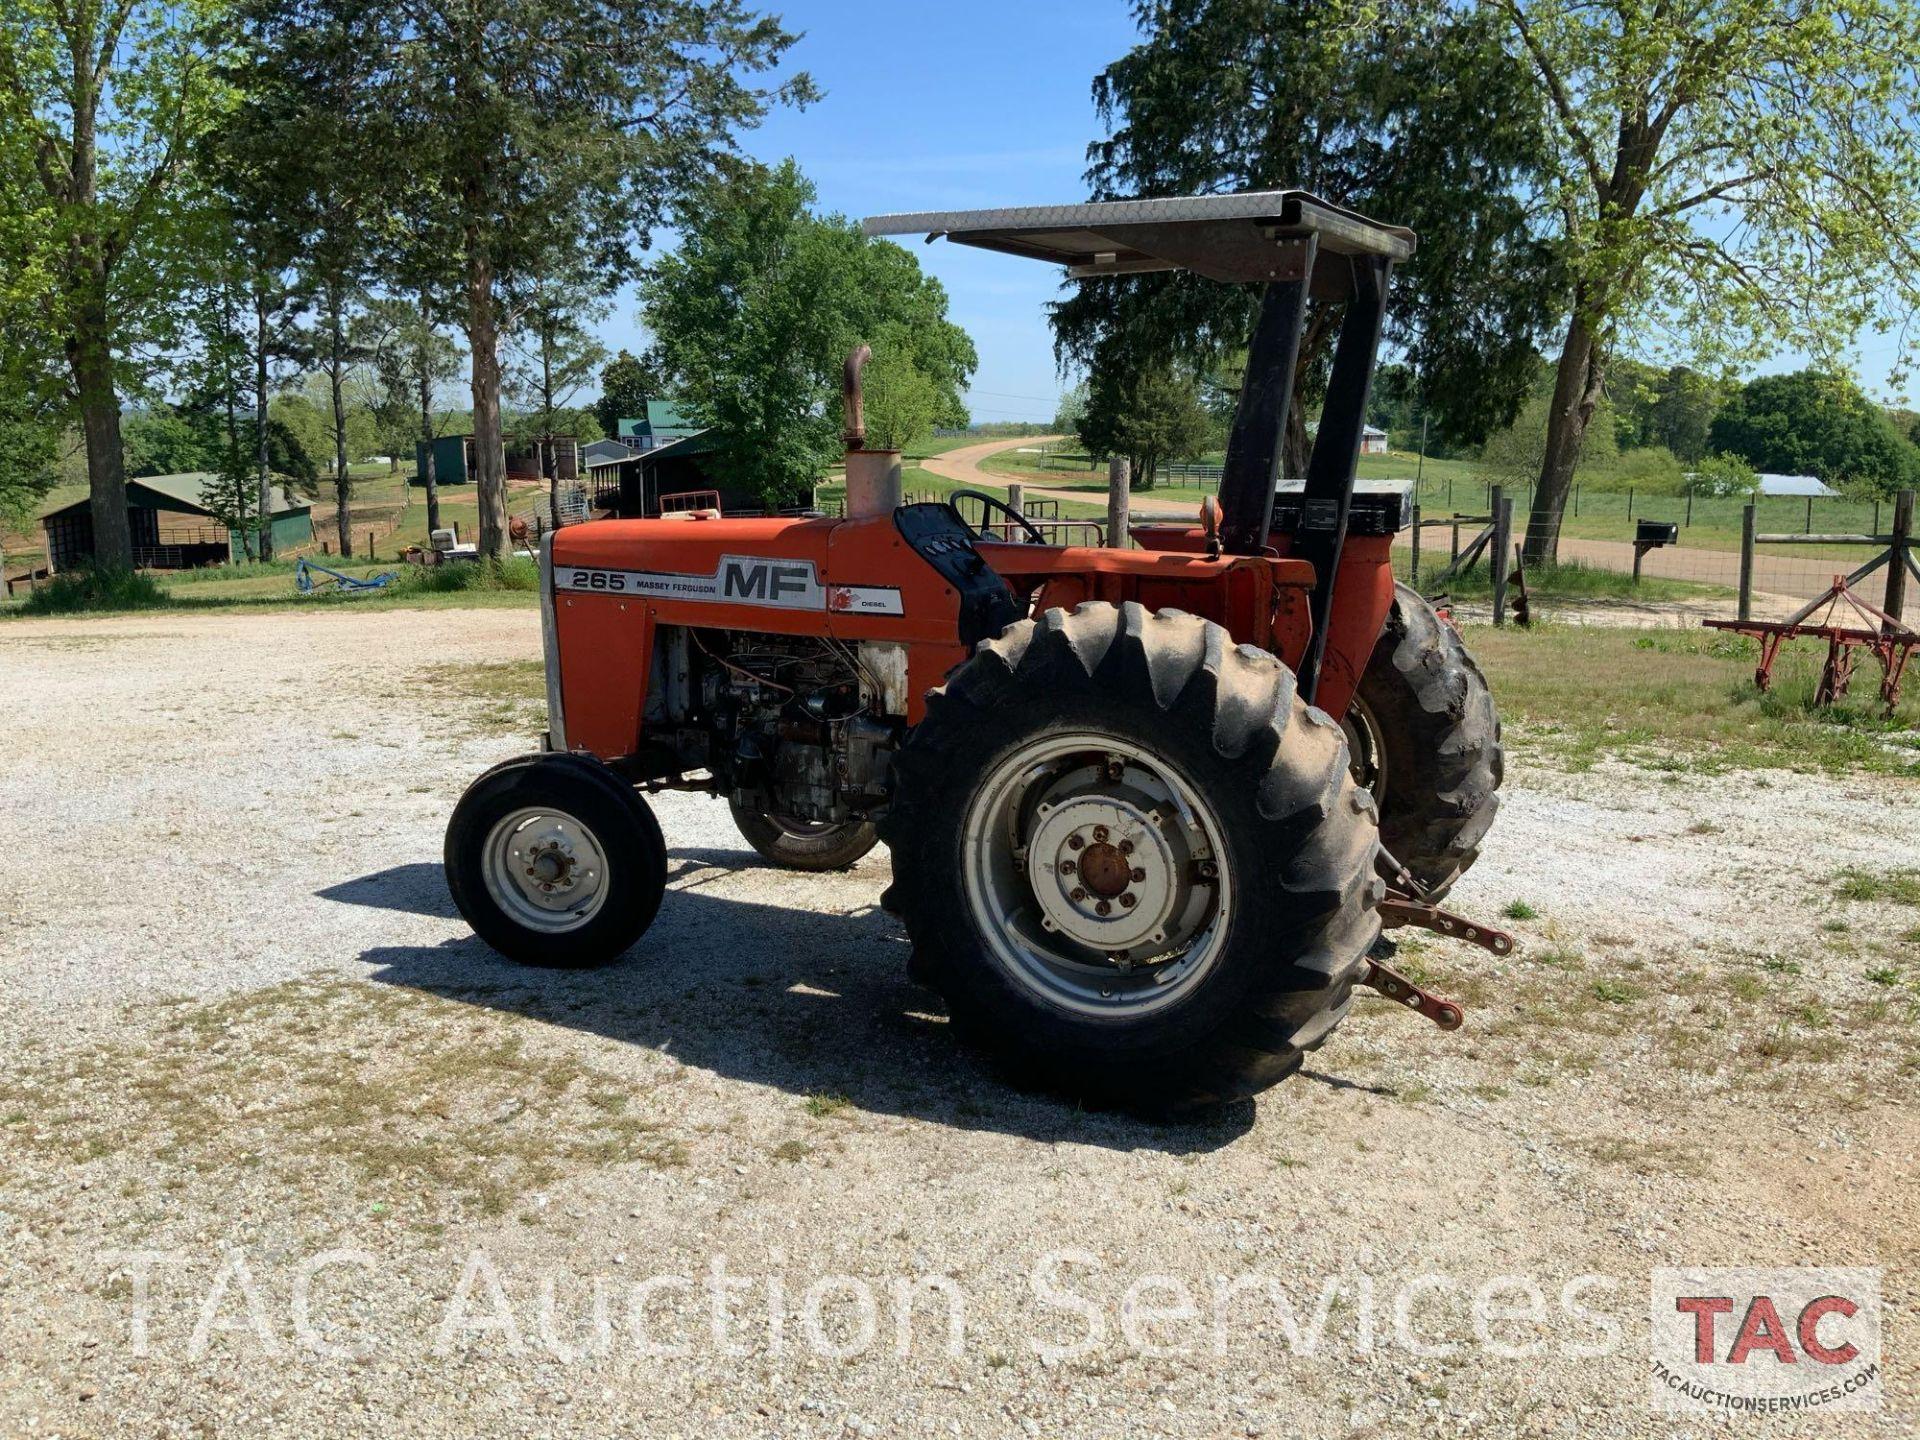 Massey Ferguson 265 FarmTractor - Image 5 of 23